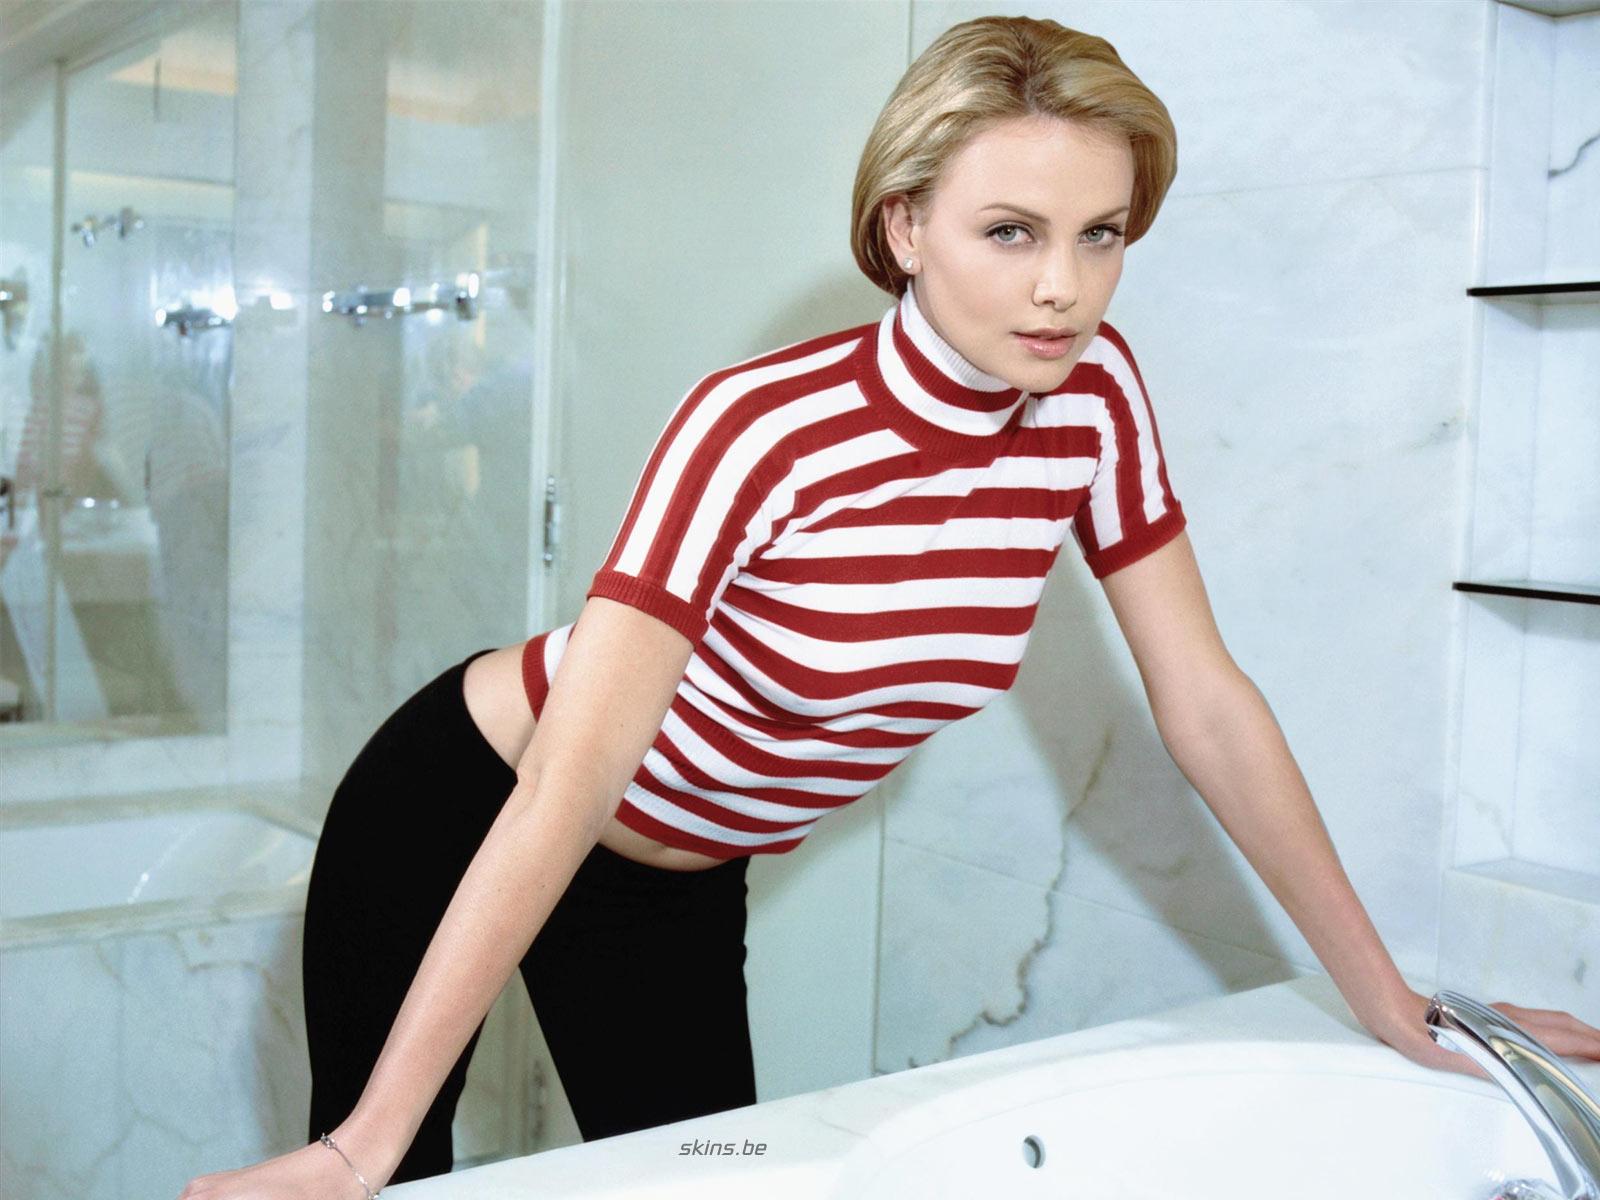 http://1.bp.blogspot.com/_GCAuqodmOE4/TS_ZDYQjQJI/AAAAAAAAG-o/VghwOrW0lnk/s1600/Charlize+Theron+In+Sexy+Strip+Shirt+Photos+%25287%2529.jpg